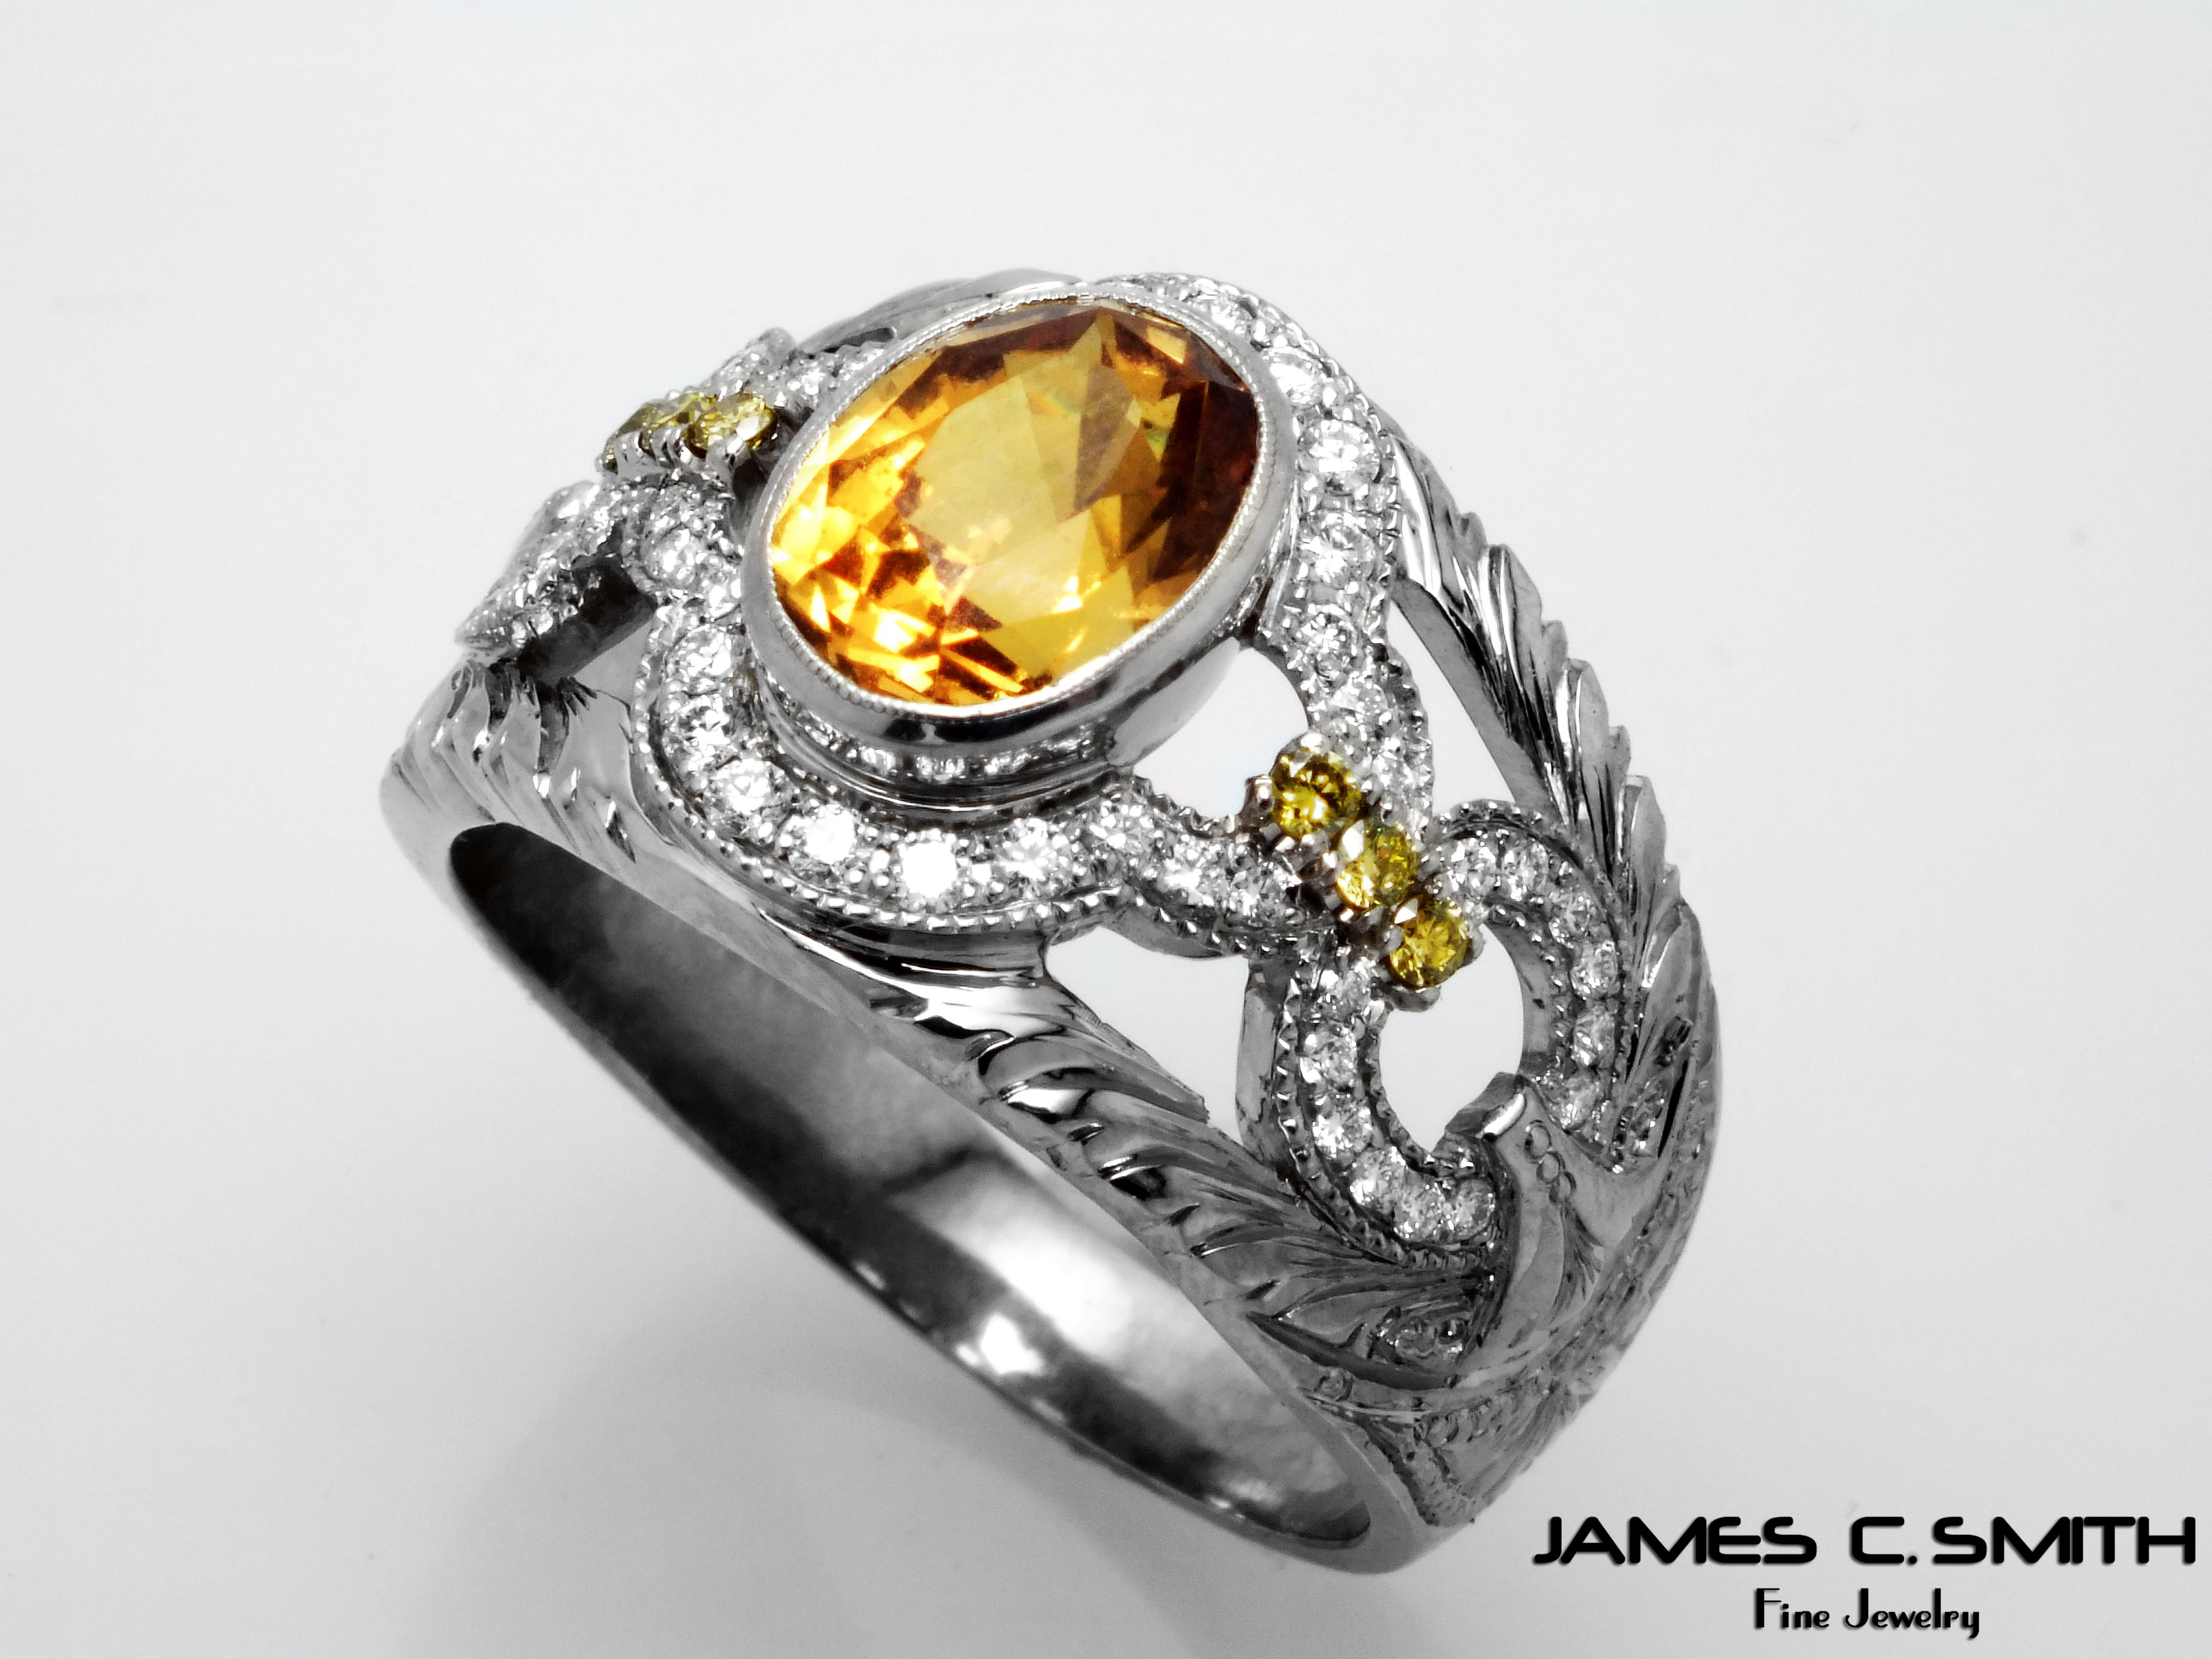 17+ James c smith jewelry traverse city ideas